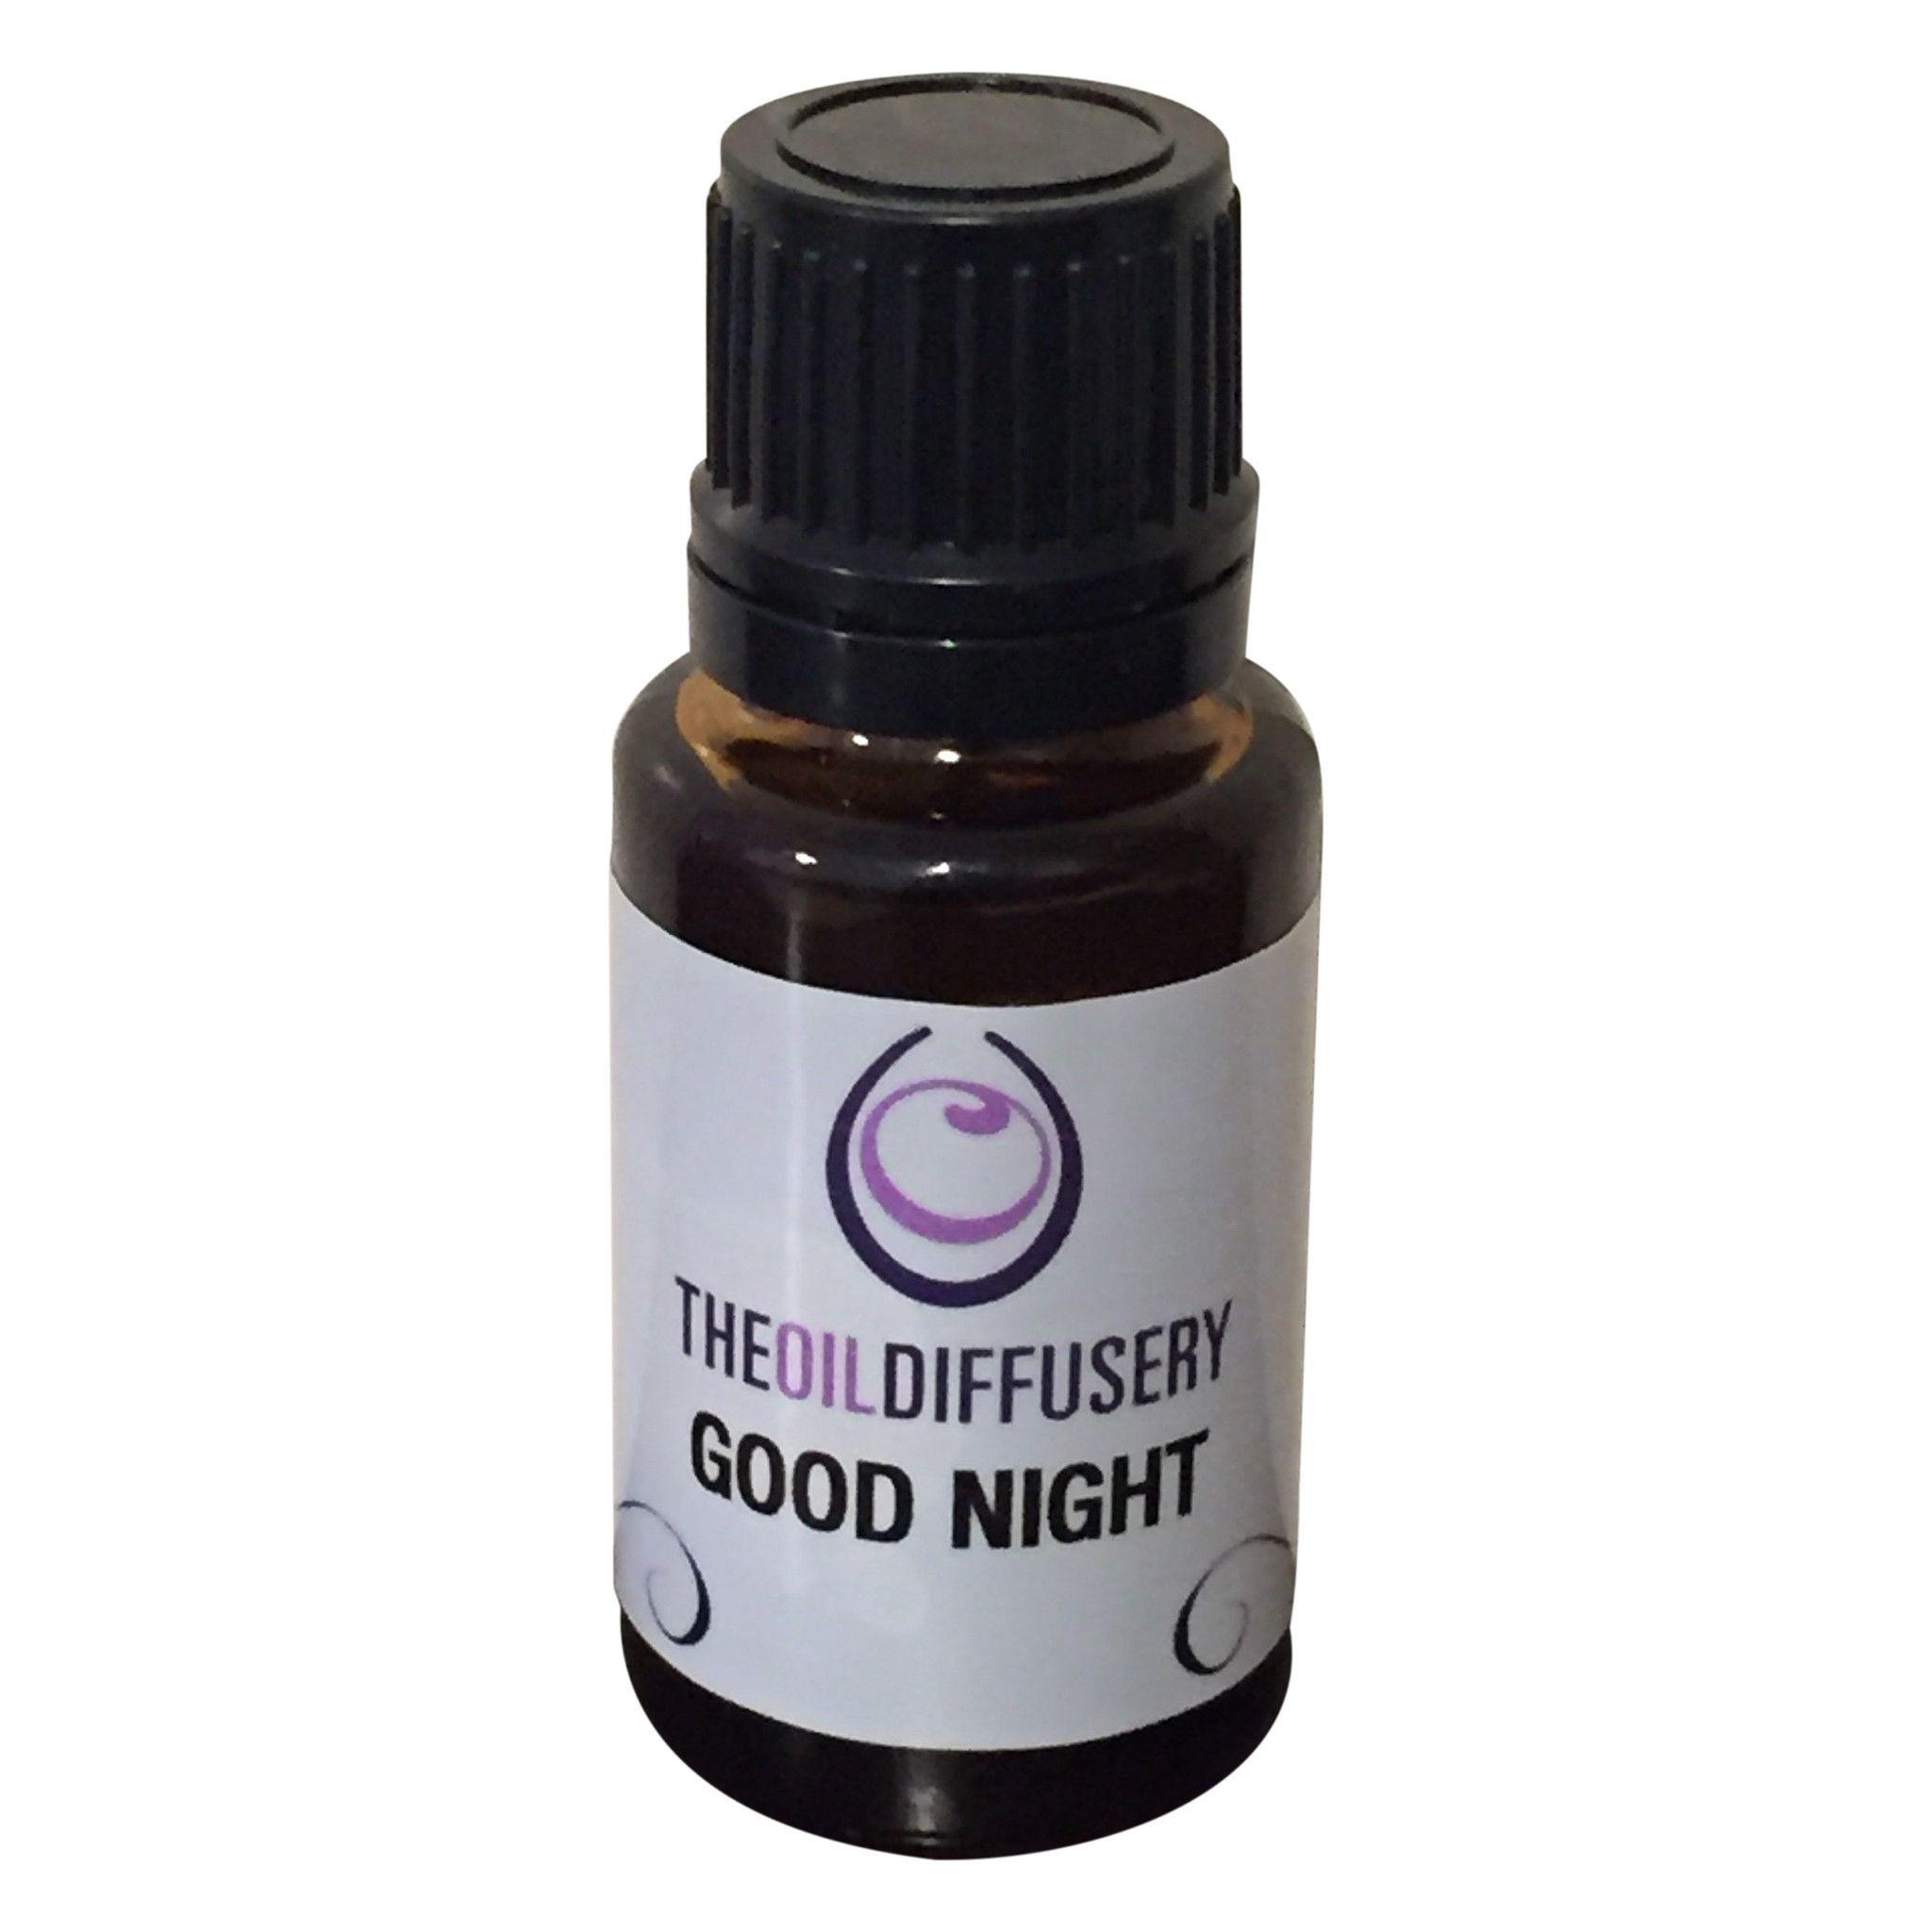 GOOD NIGHT ESSENTIAL OIL BLEND